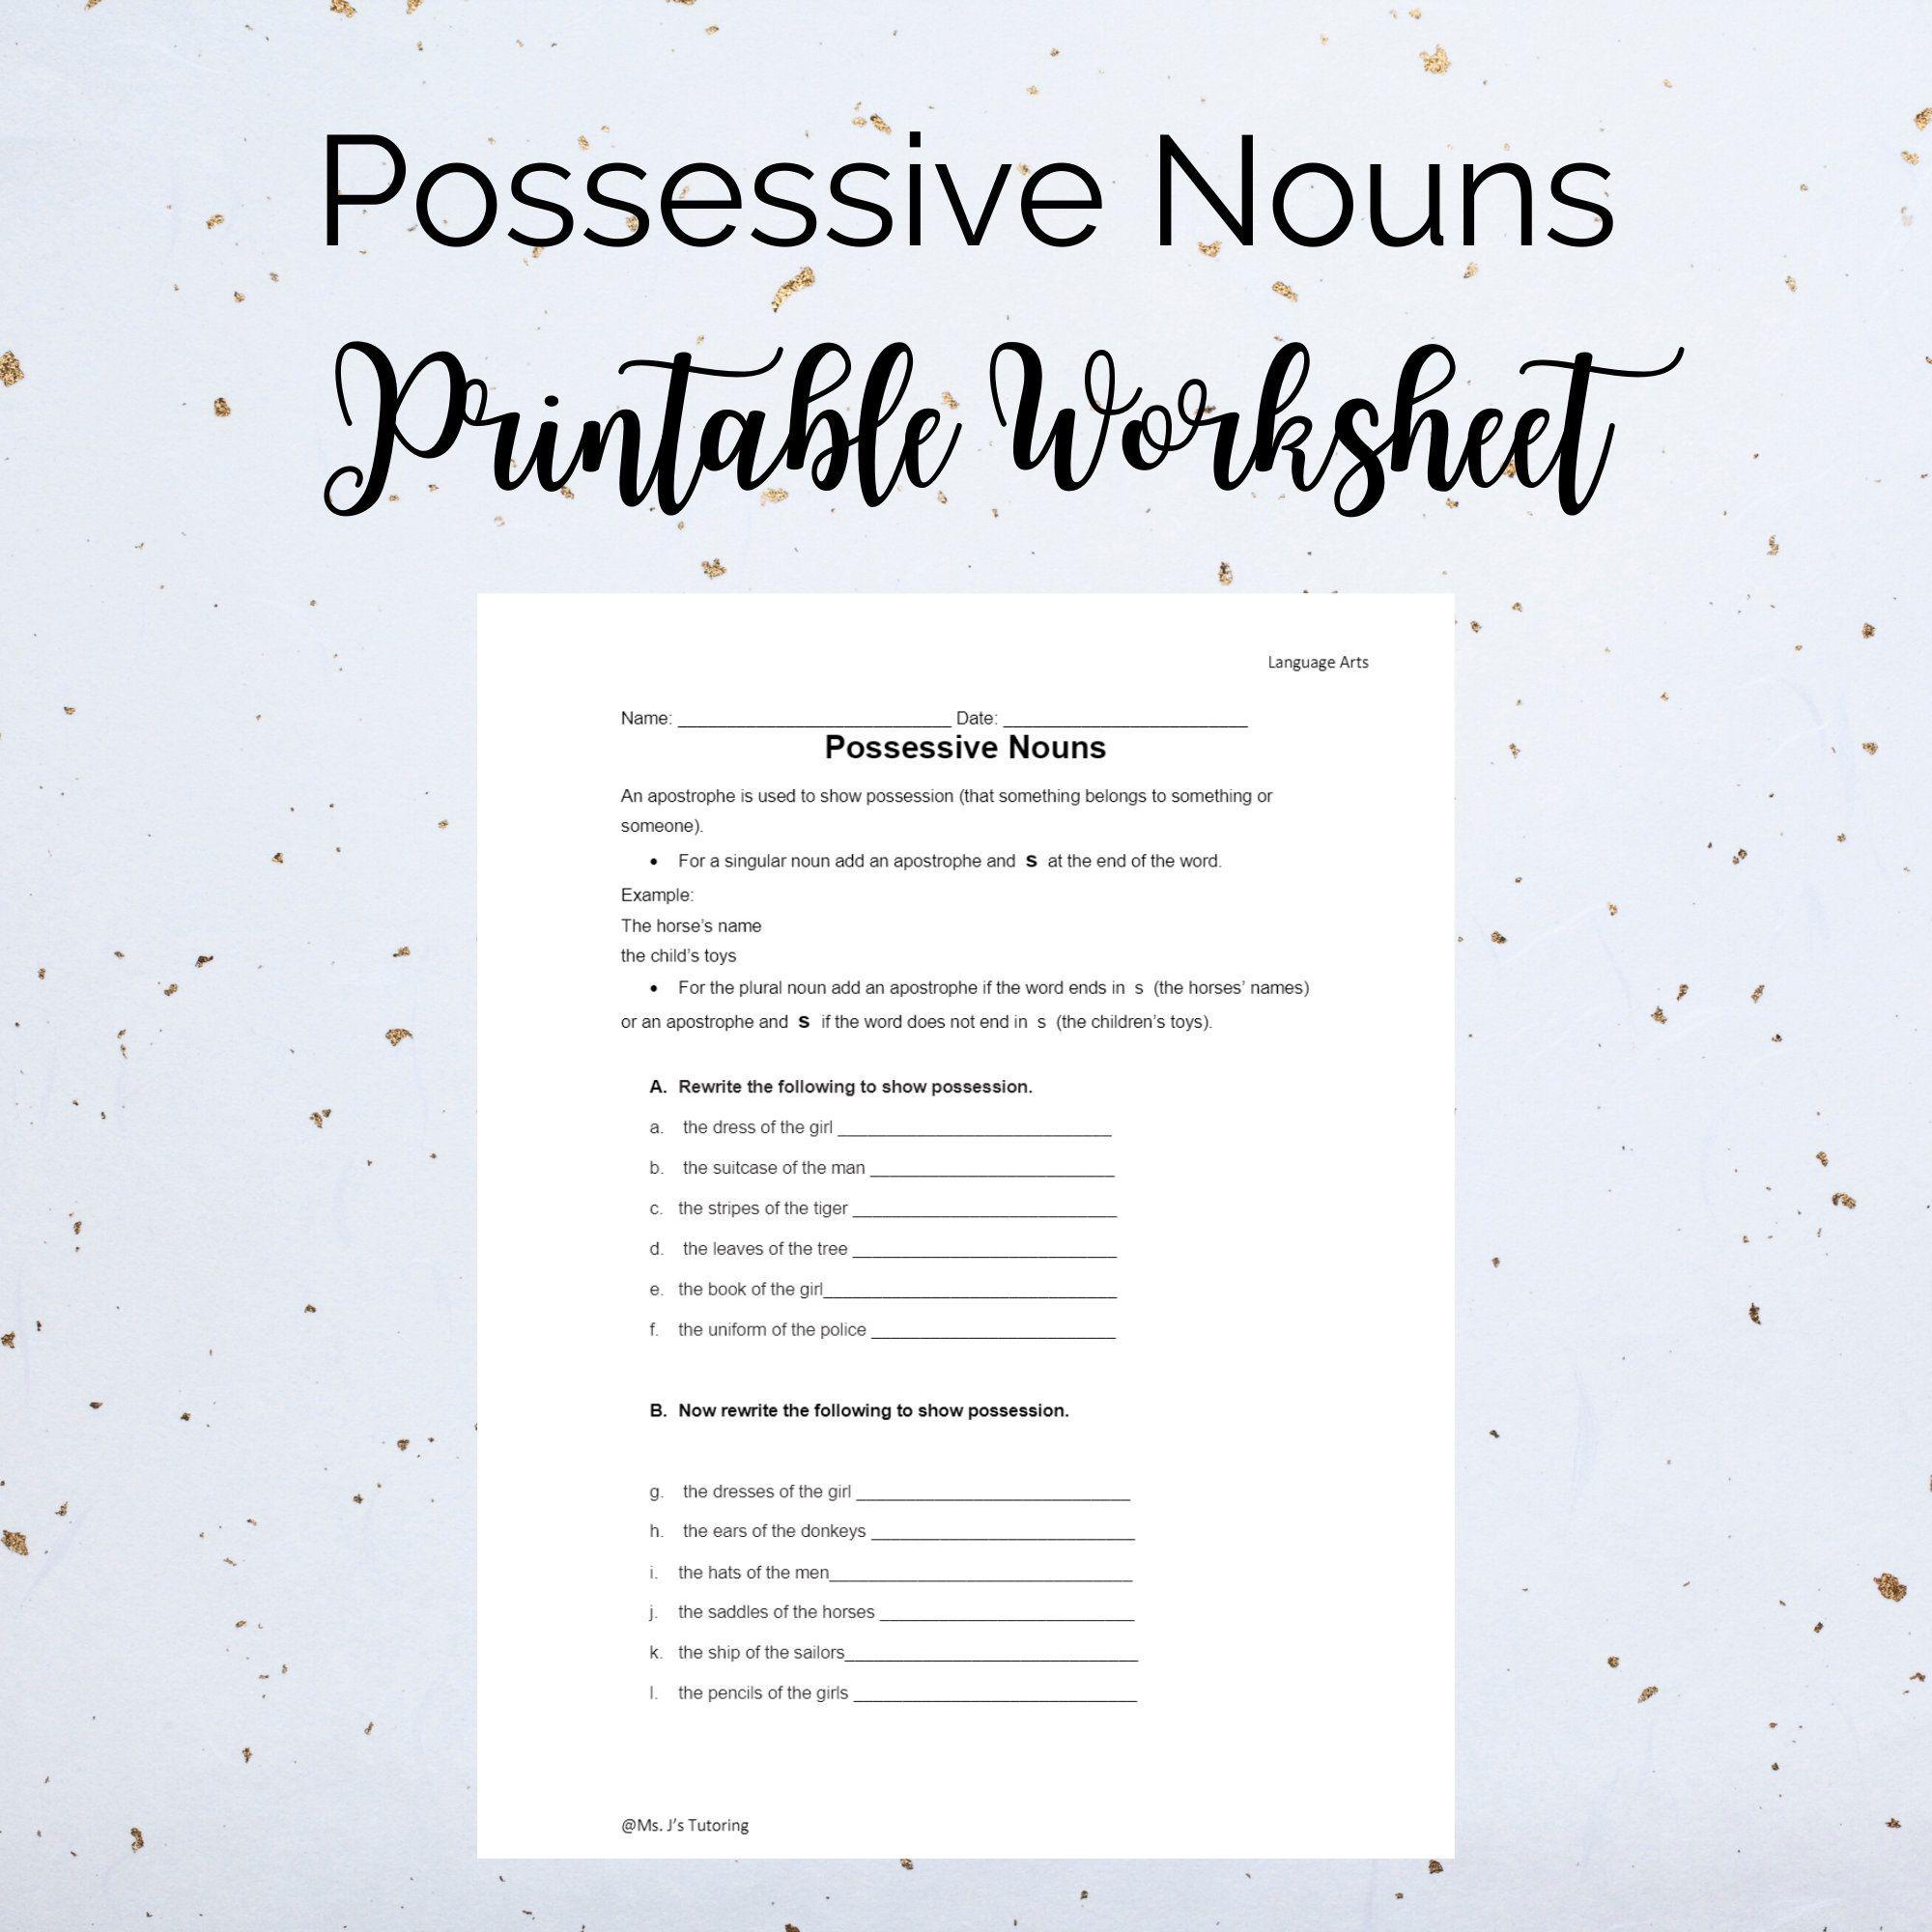 Nouns Worksheets And Printouts Proper Nouns Worksheet Nouns Worksheet Common And Proper Nouns